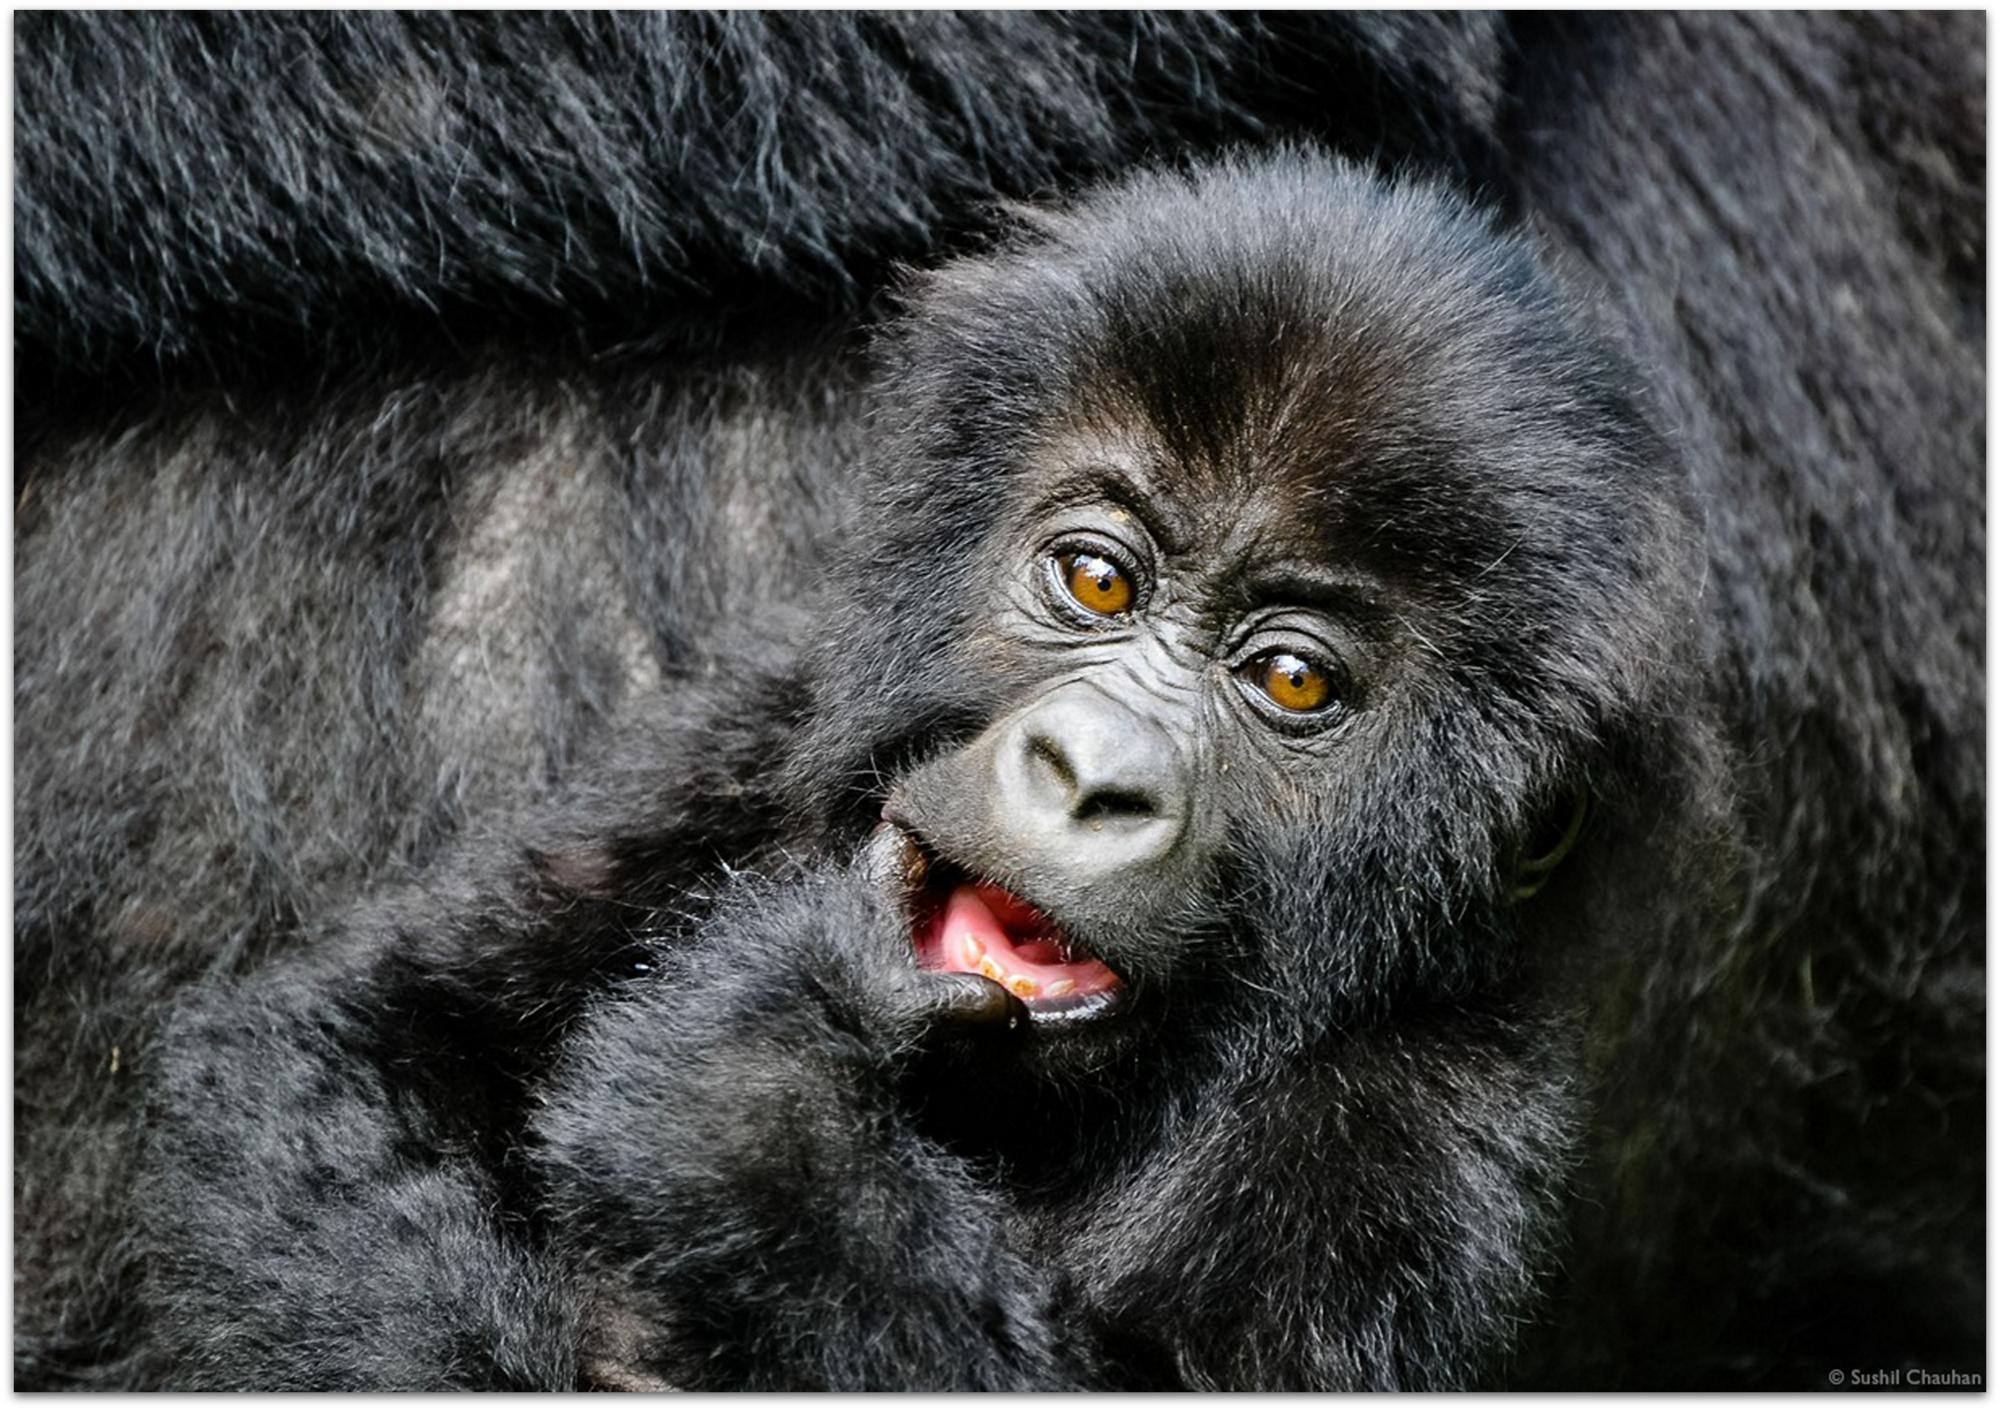 Lowland gorilla in Kahuzi-Biéga National Park © Sushil Chauhan